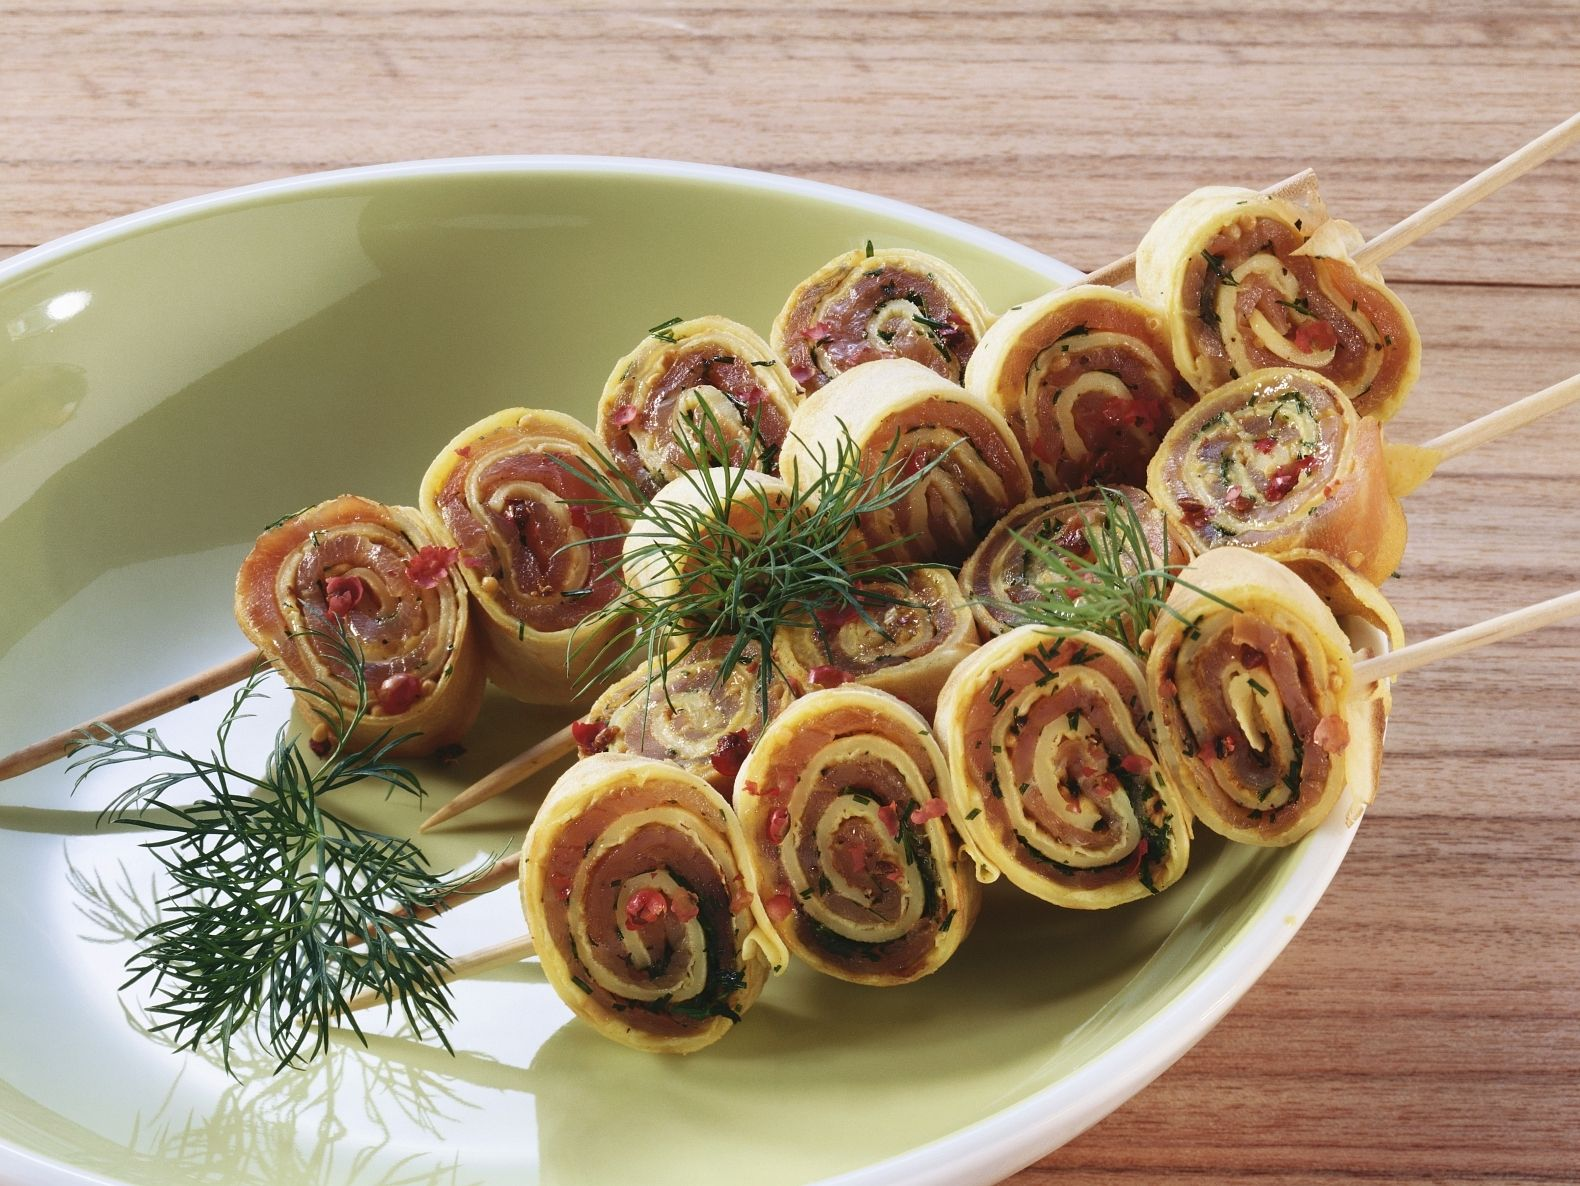 Fingerfood Kalt Fur Kindergeburtstag Heiss And Kalt Das Culinarium